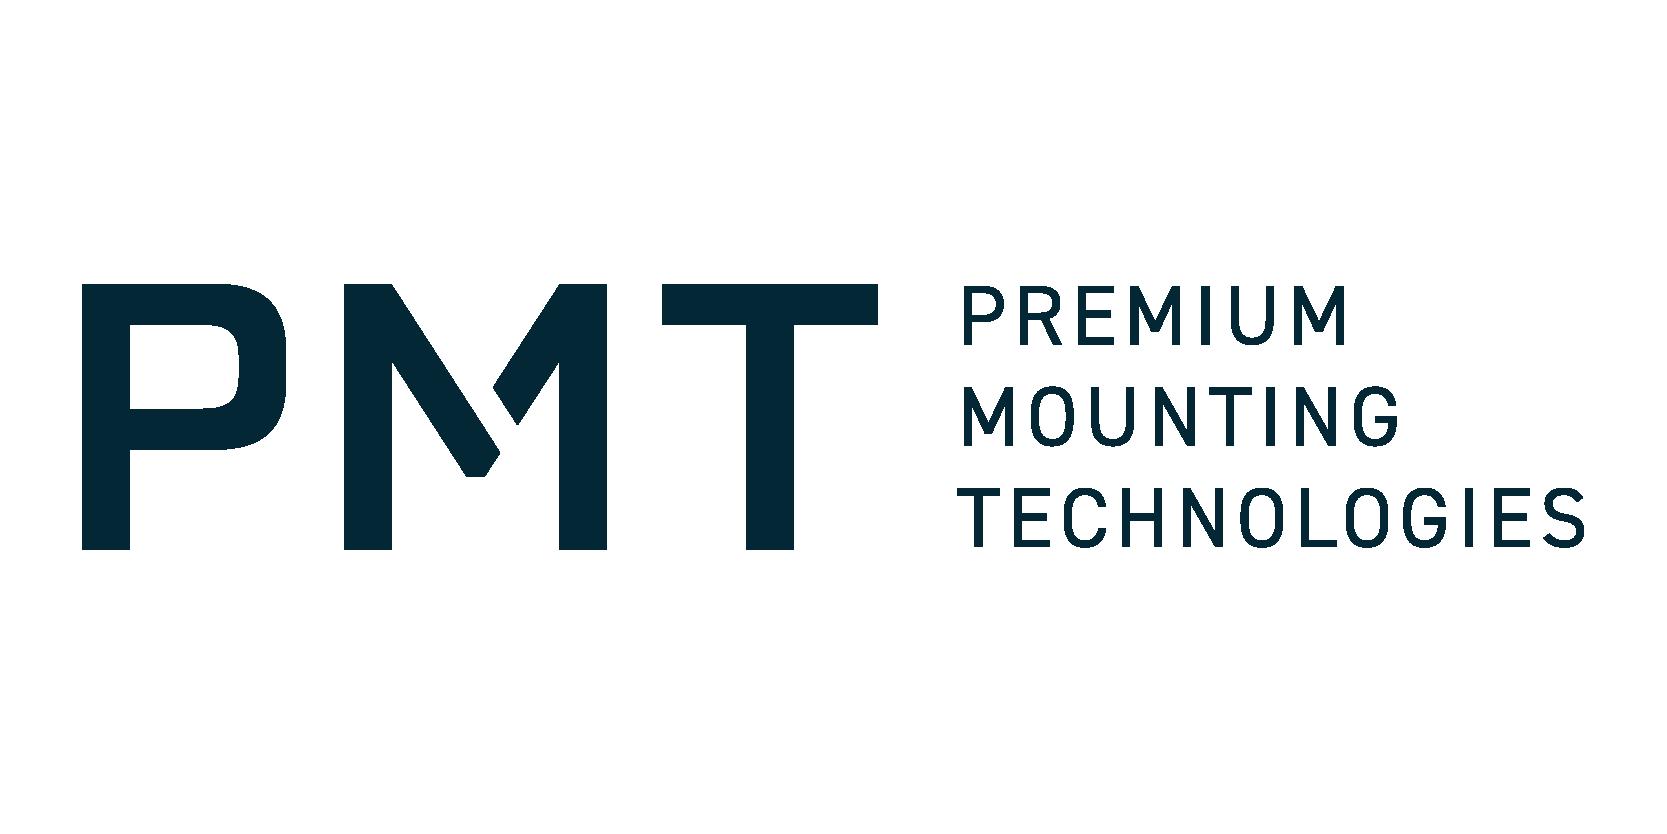 memodo_PMT-Logo_premium-mounting-technologies-pmt-logo